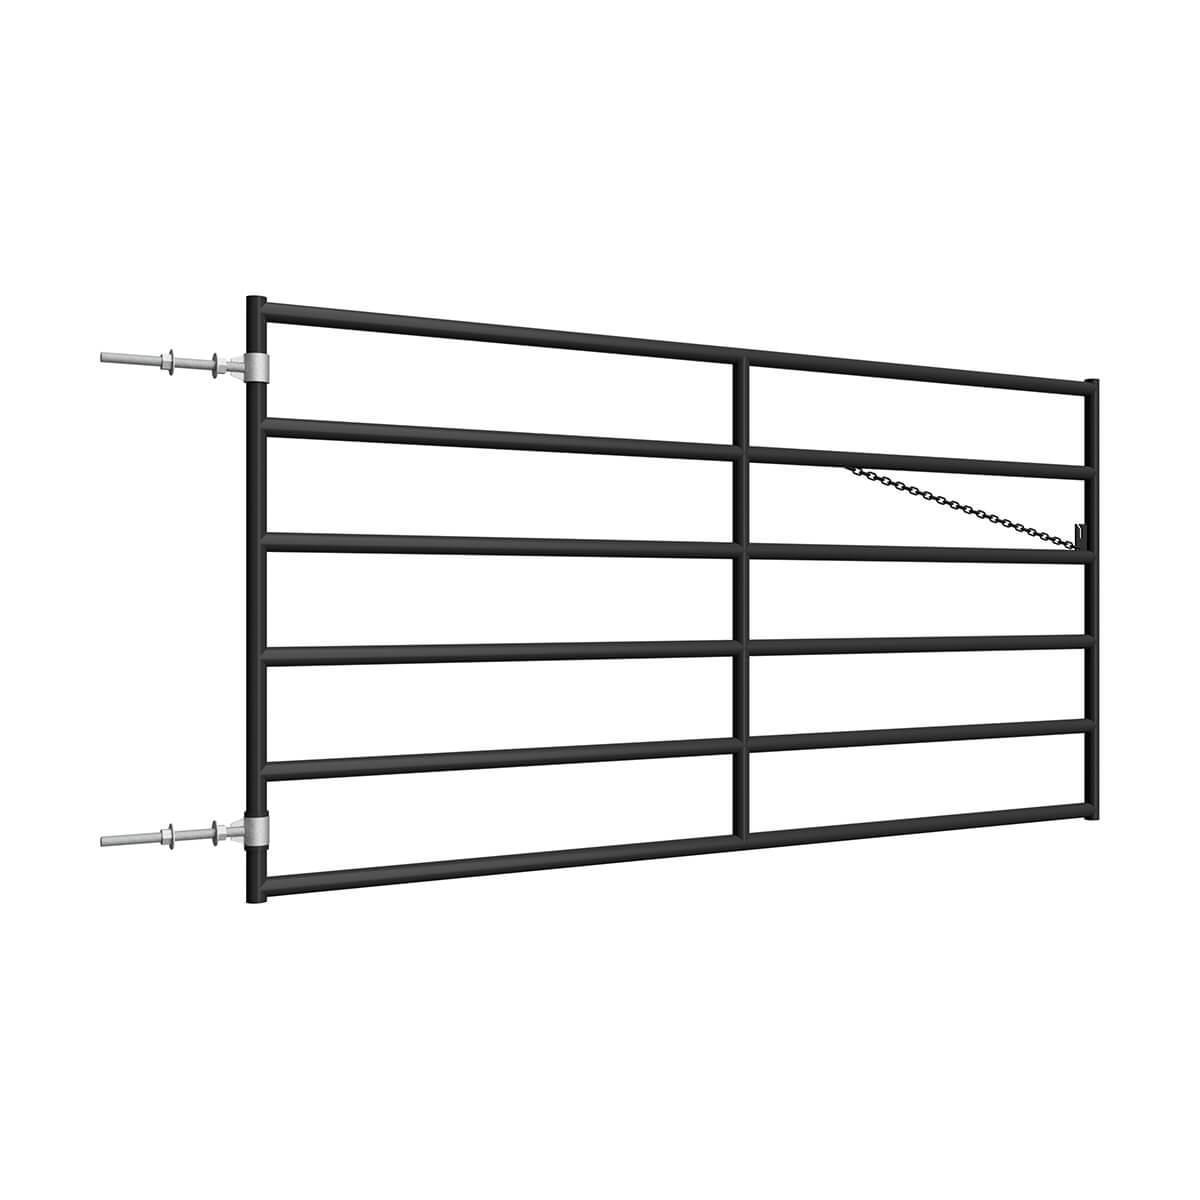 2W 500 Series 12' Corral Gate